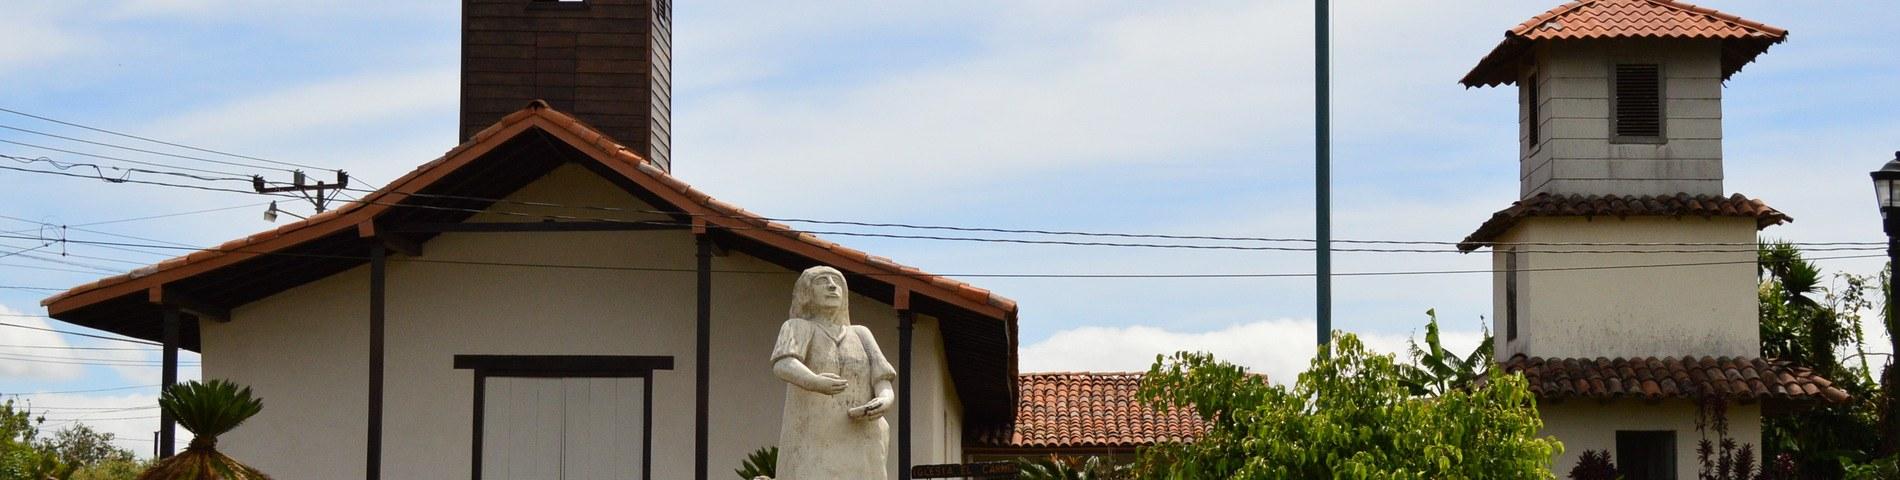 Santo Domingo de Heredia